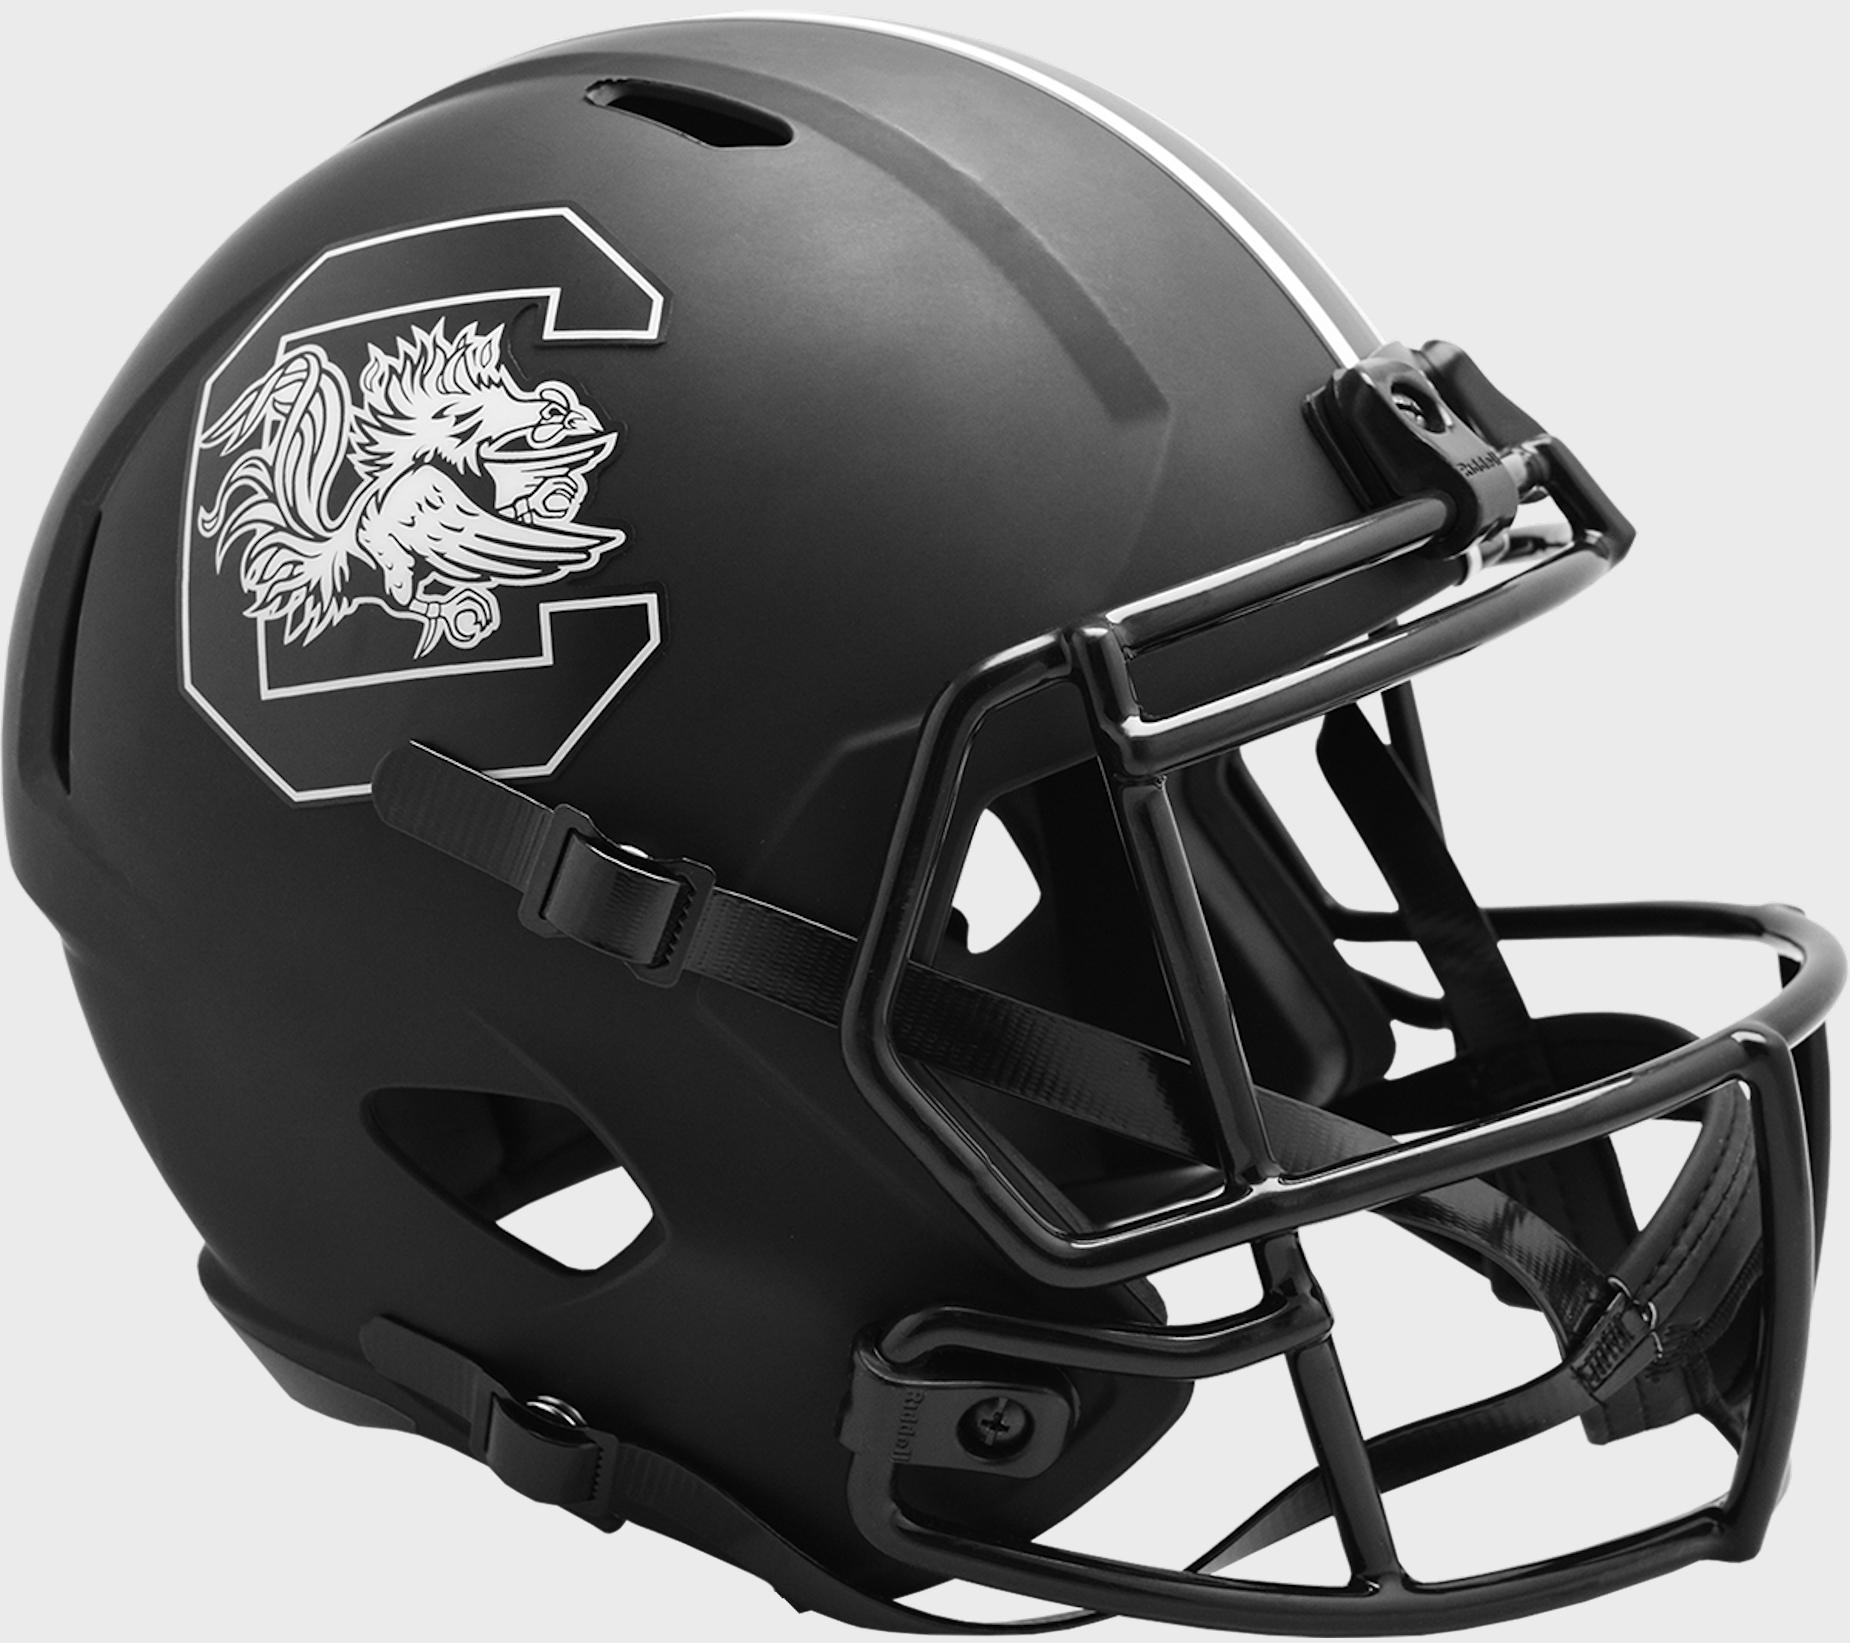 South Carolina Gamecocks Speed Replica Football Helmet <B>ECLIPSE </B>